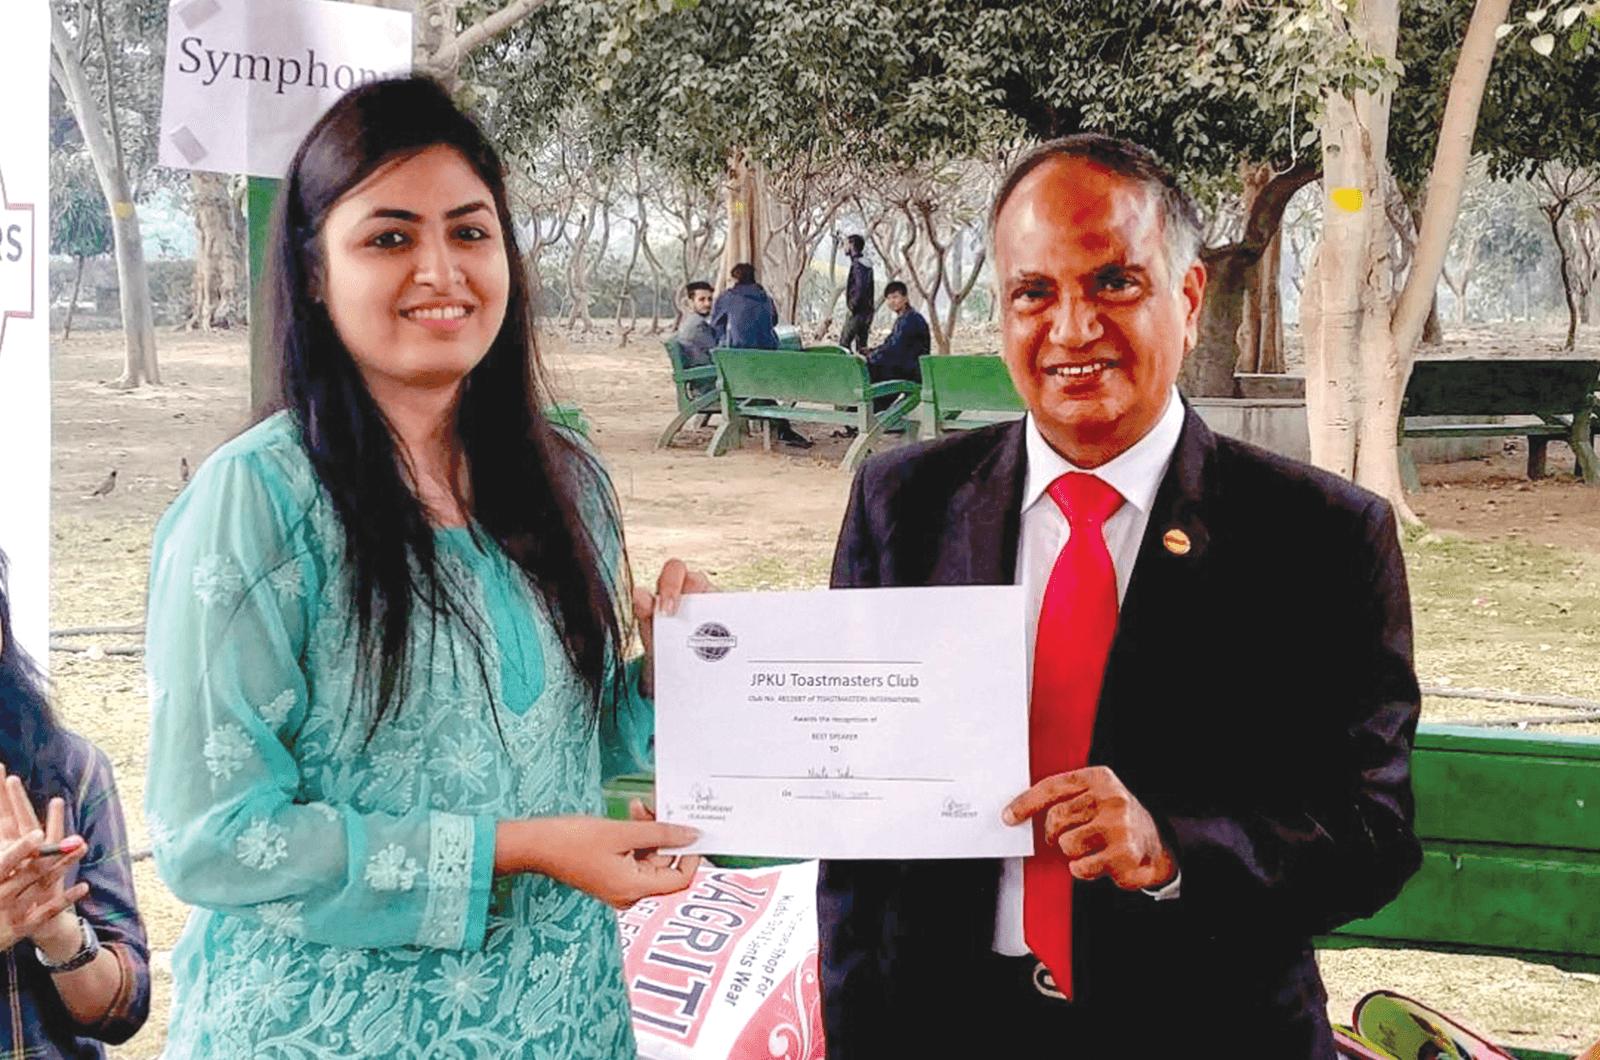 Menon awards a New Delhi JPKU club member the best speaker certificate.